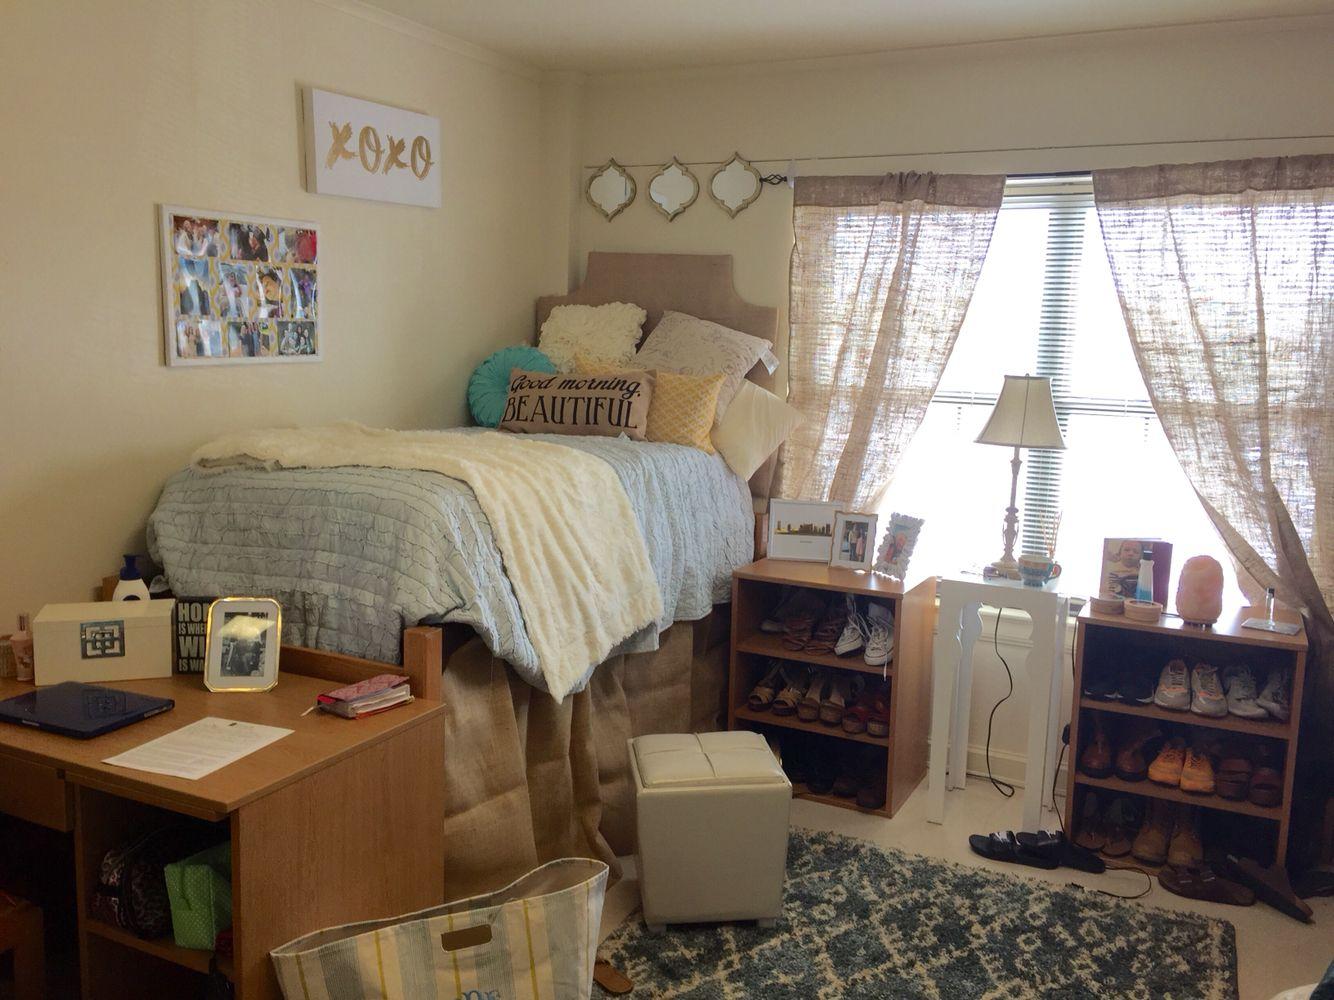 Dawson Hall At Baylor University · Dorm StuffCollege Dorm RoomsDorm ... Part 84